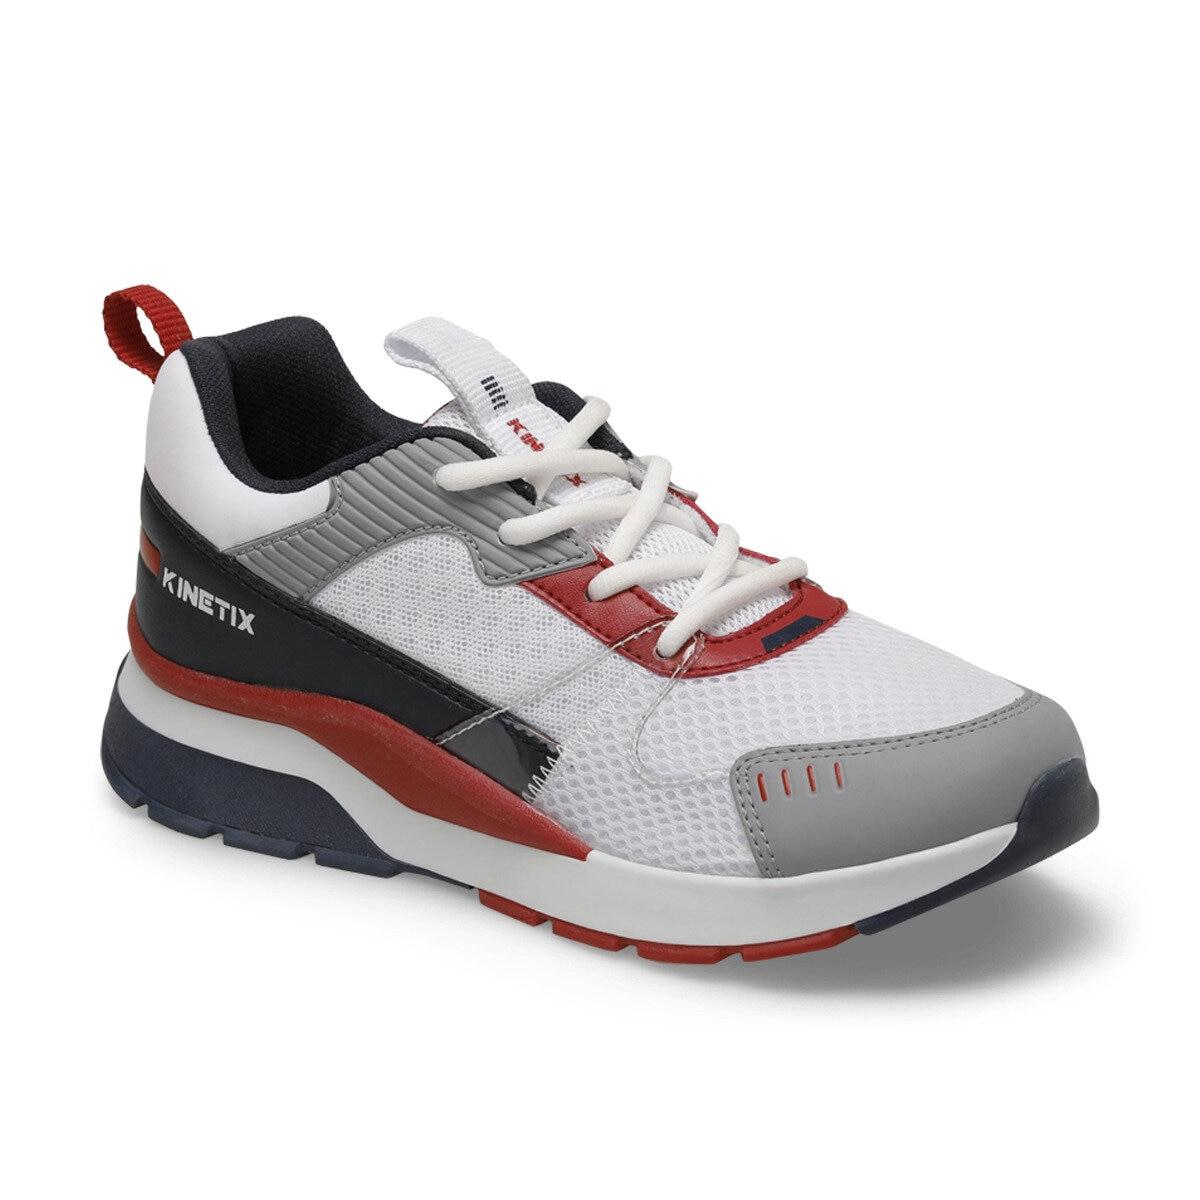 FLO CELESTE White Male Child Hiking Shoes KINETIX